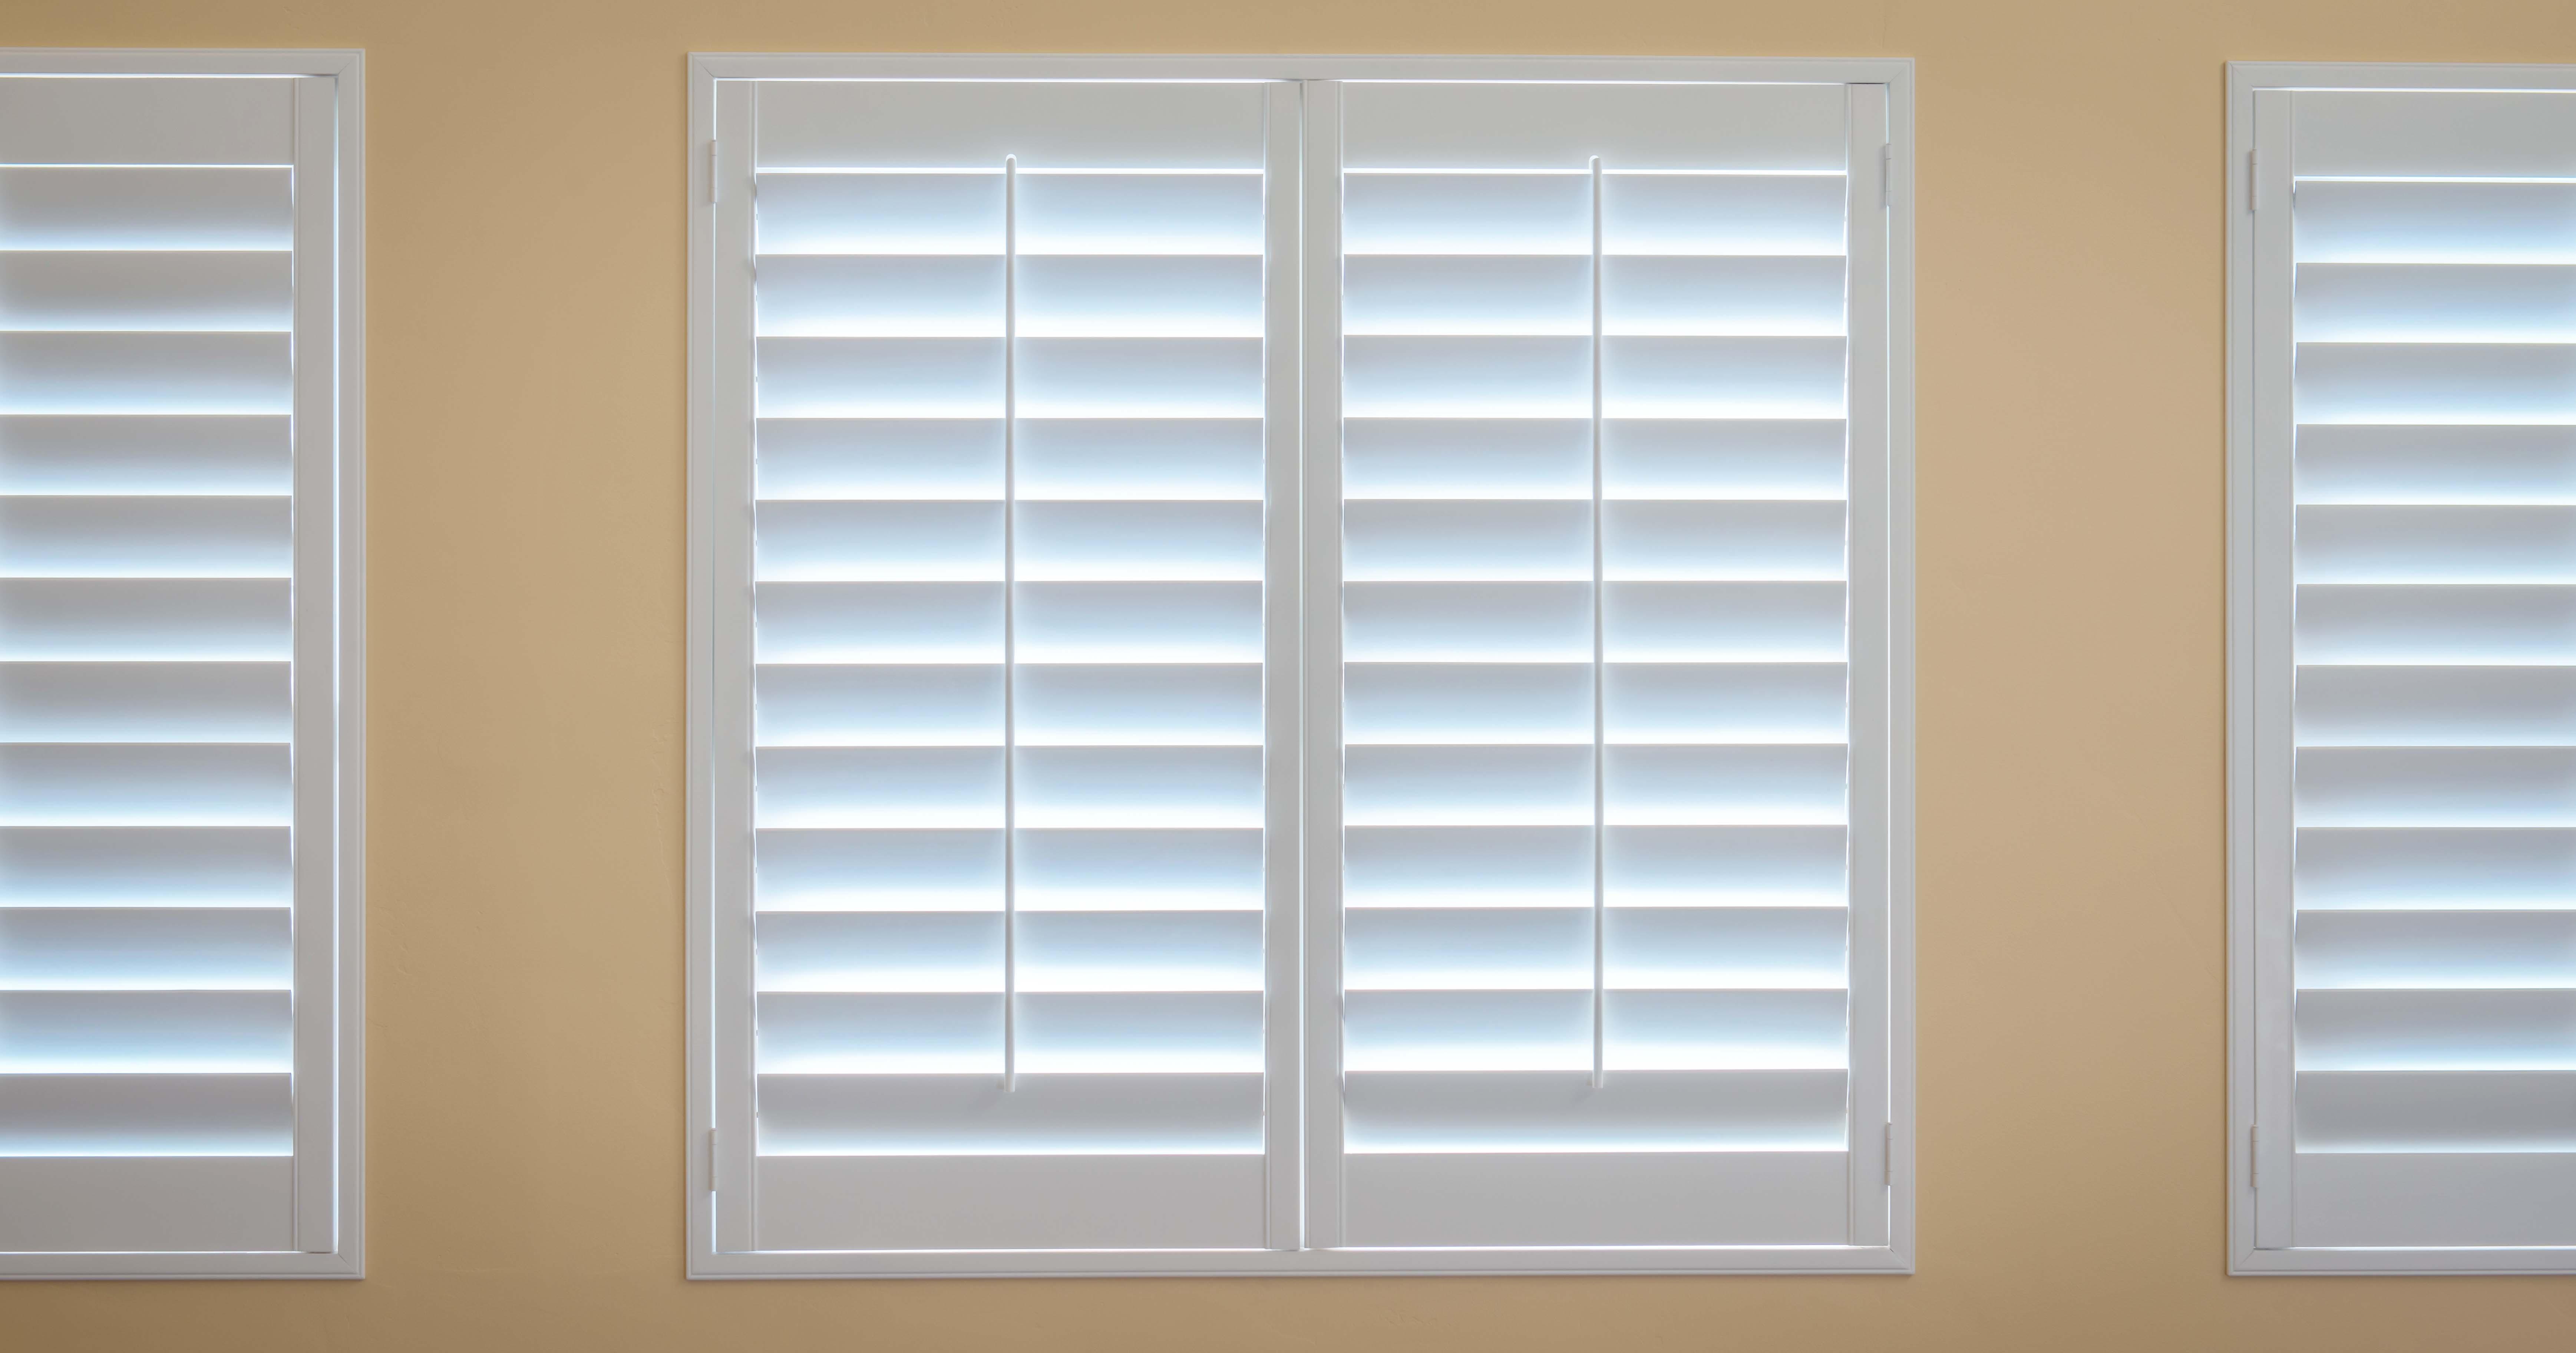 Amazing outdoor window shutter ideas carehomedecor for Window shutter crafts